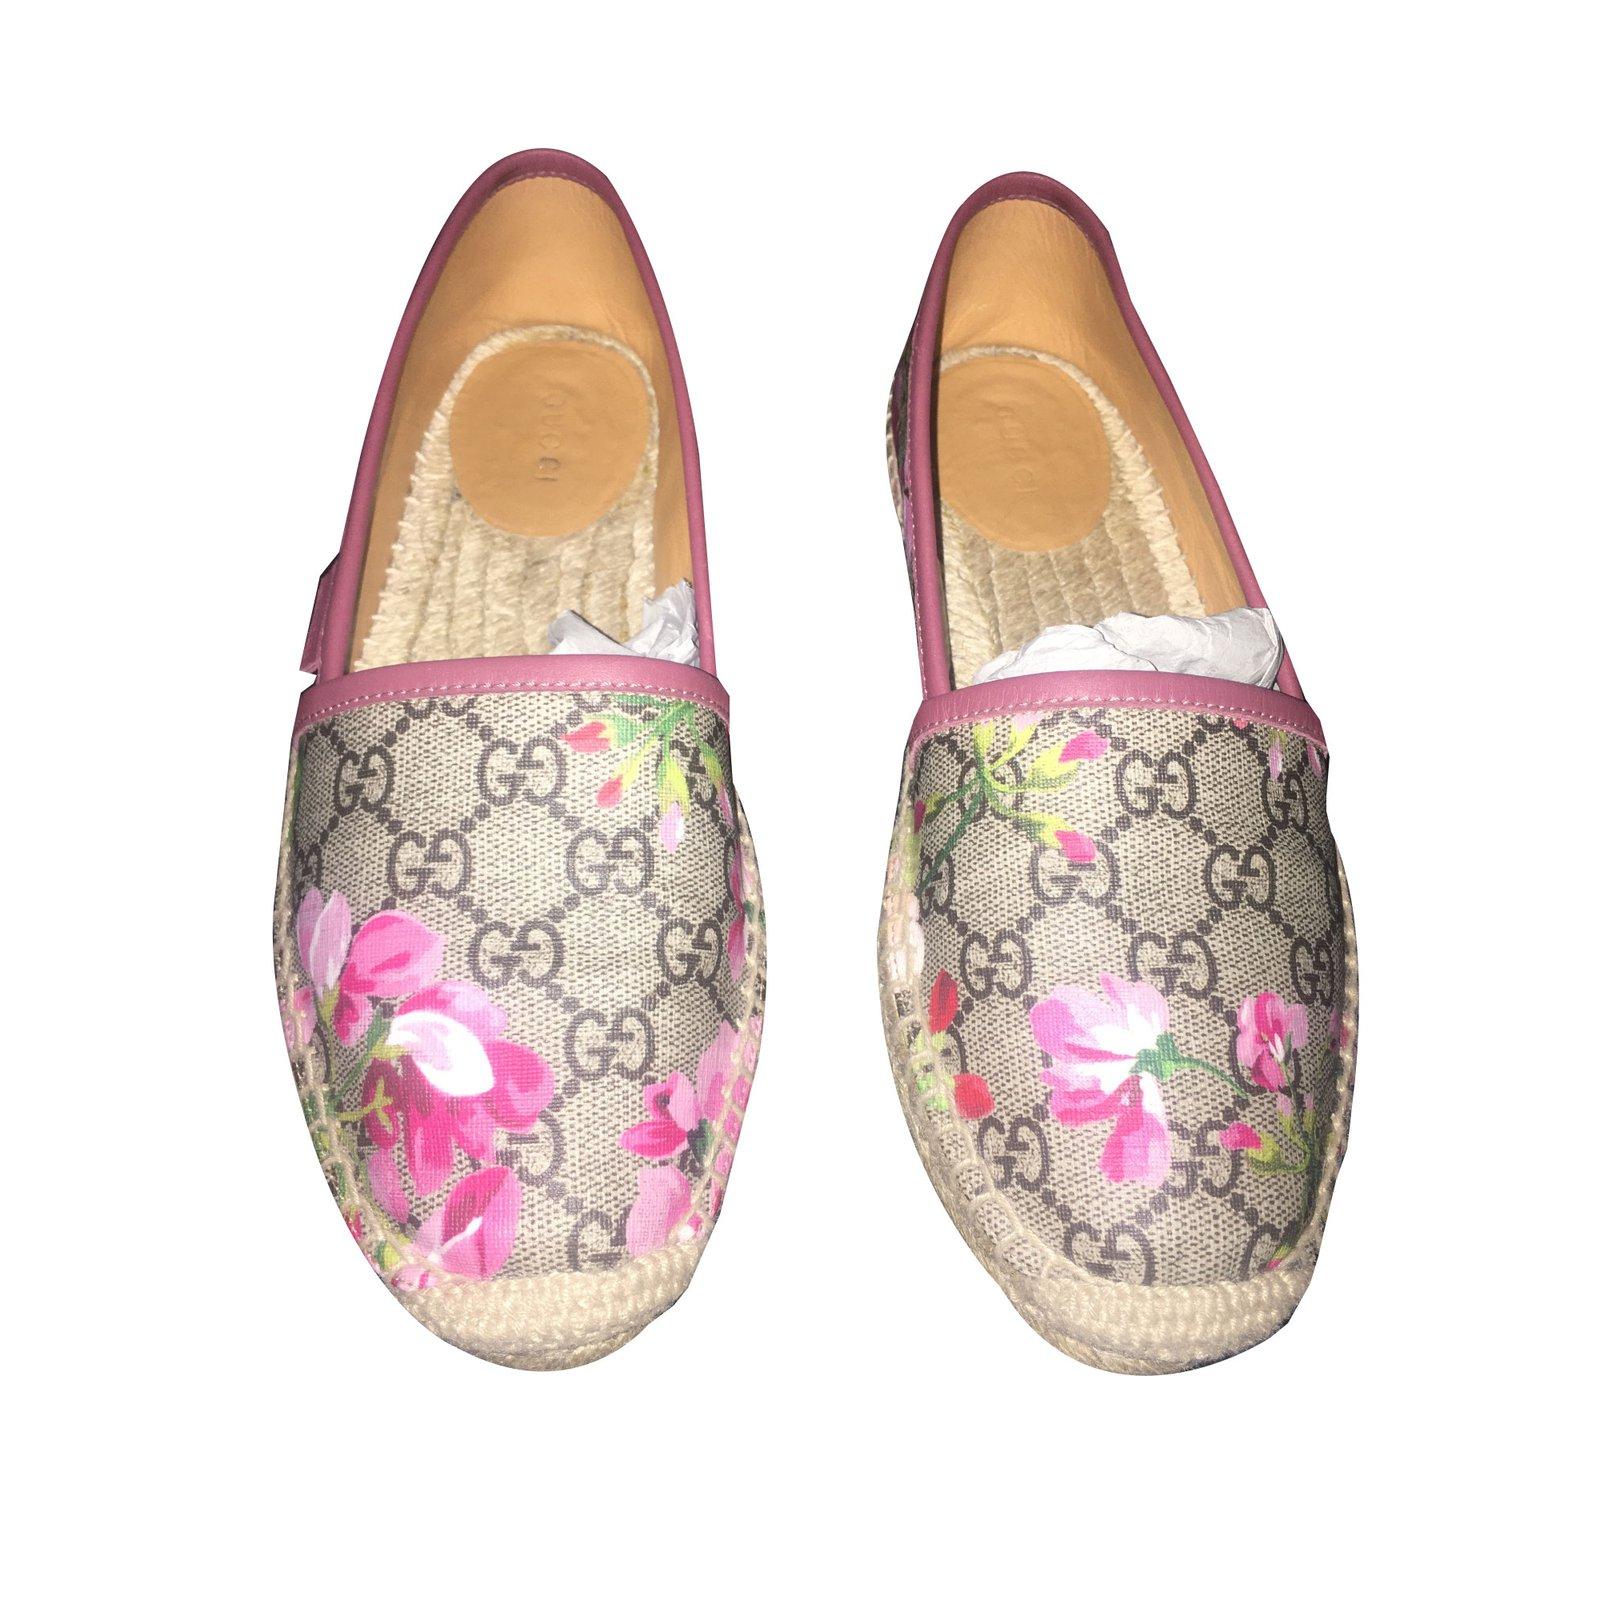 78423e02bf5 Gucci Gucci Bloom Espadrilles Espadrilles Leather Pink ref.44172 ...